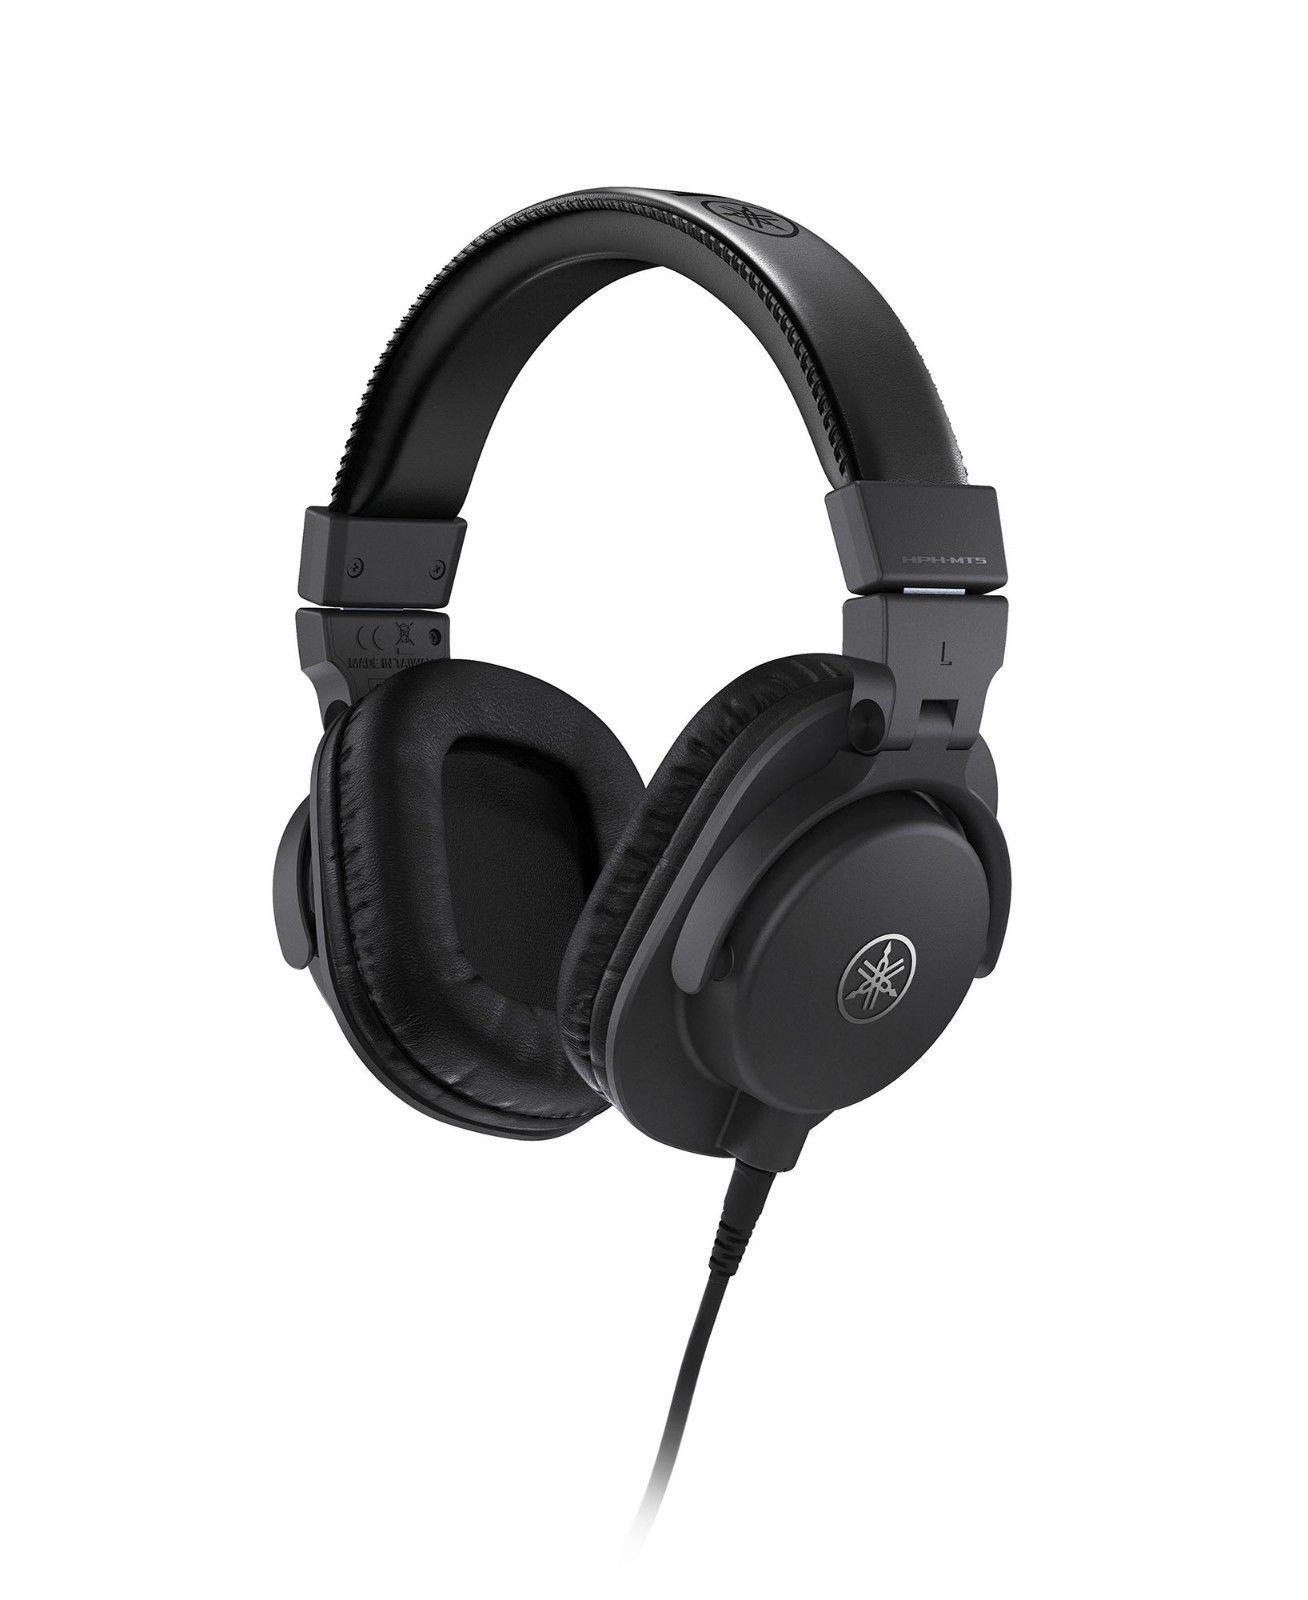 Yamaha HPHMT5 Studio Monitor OverEar Headphones Black